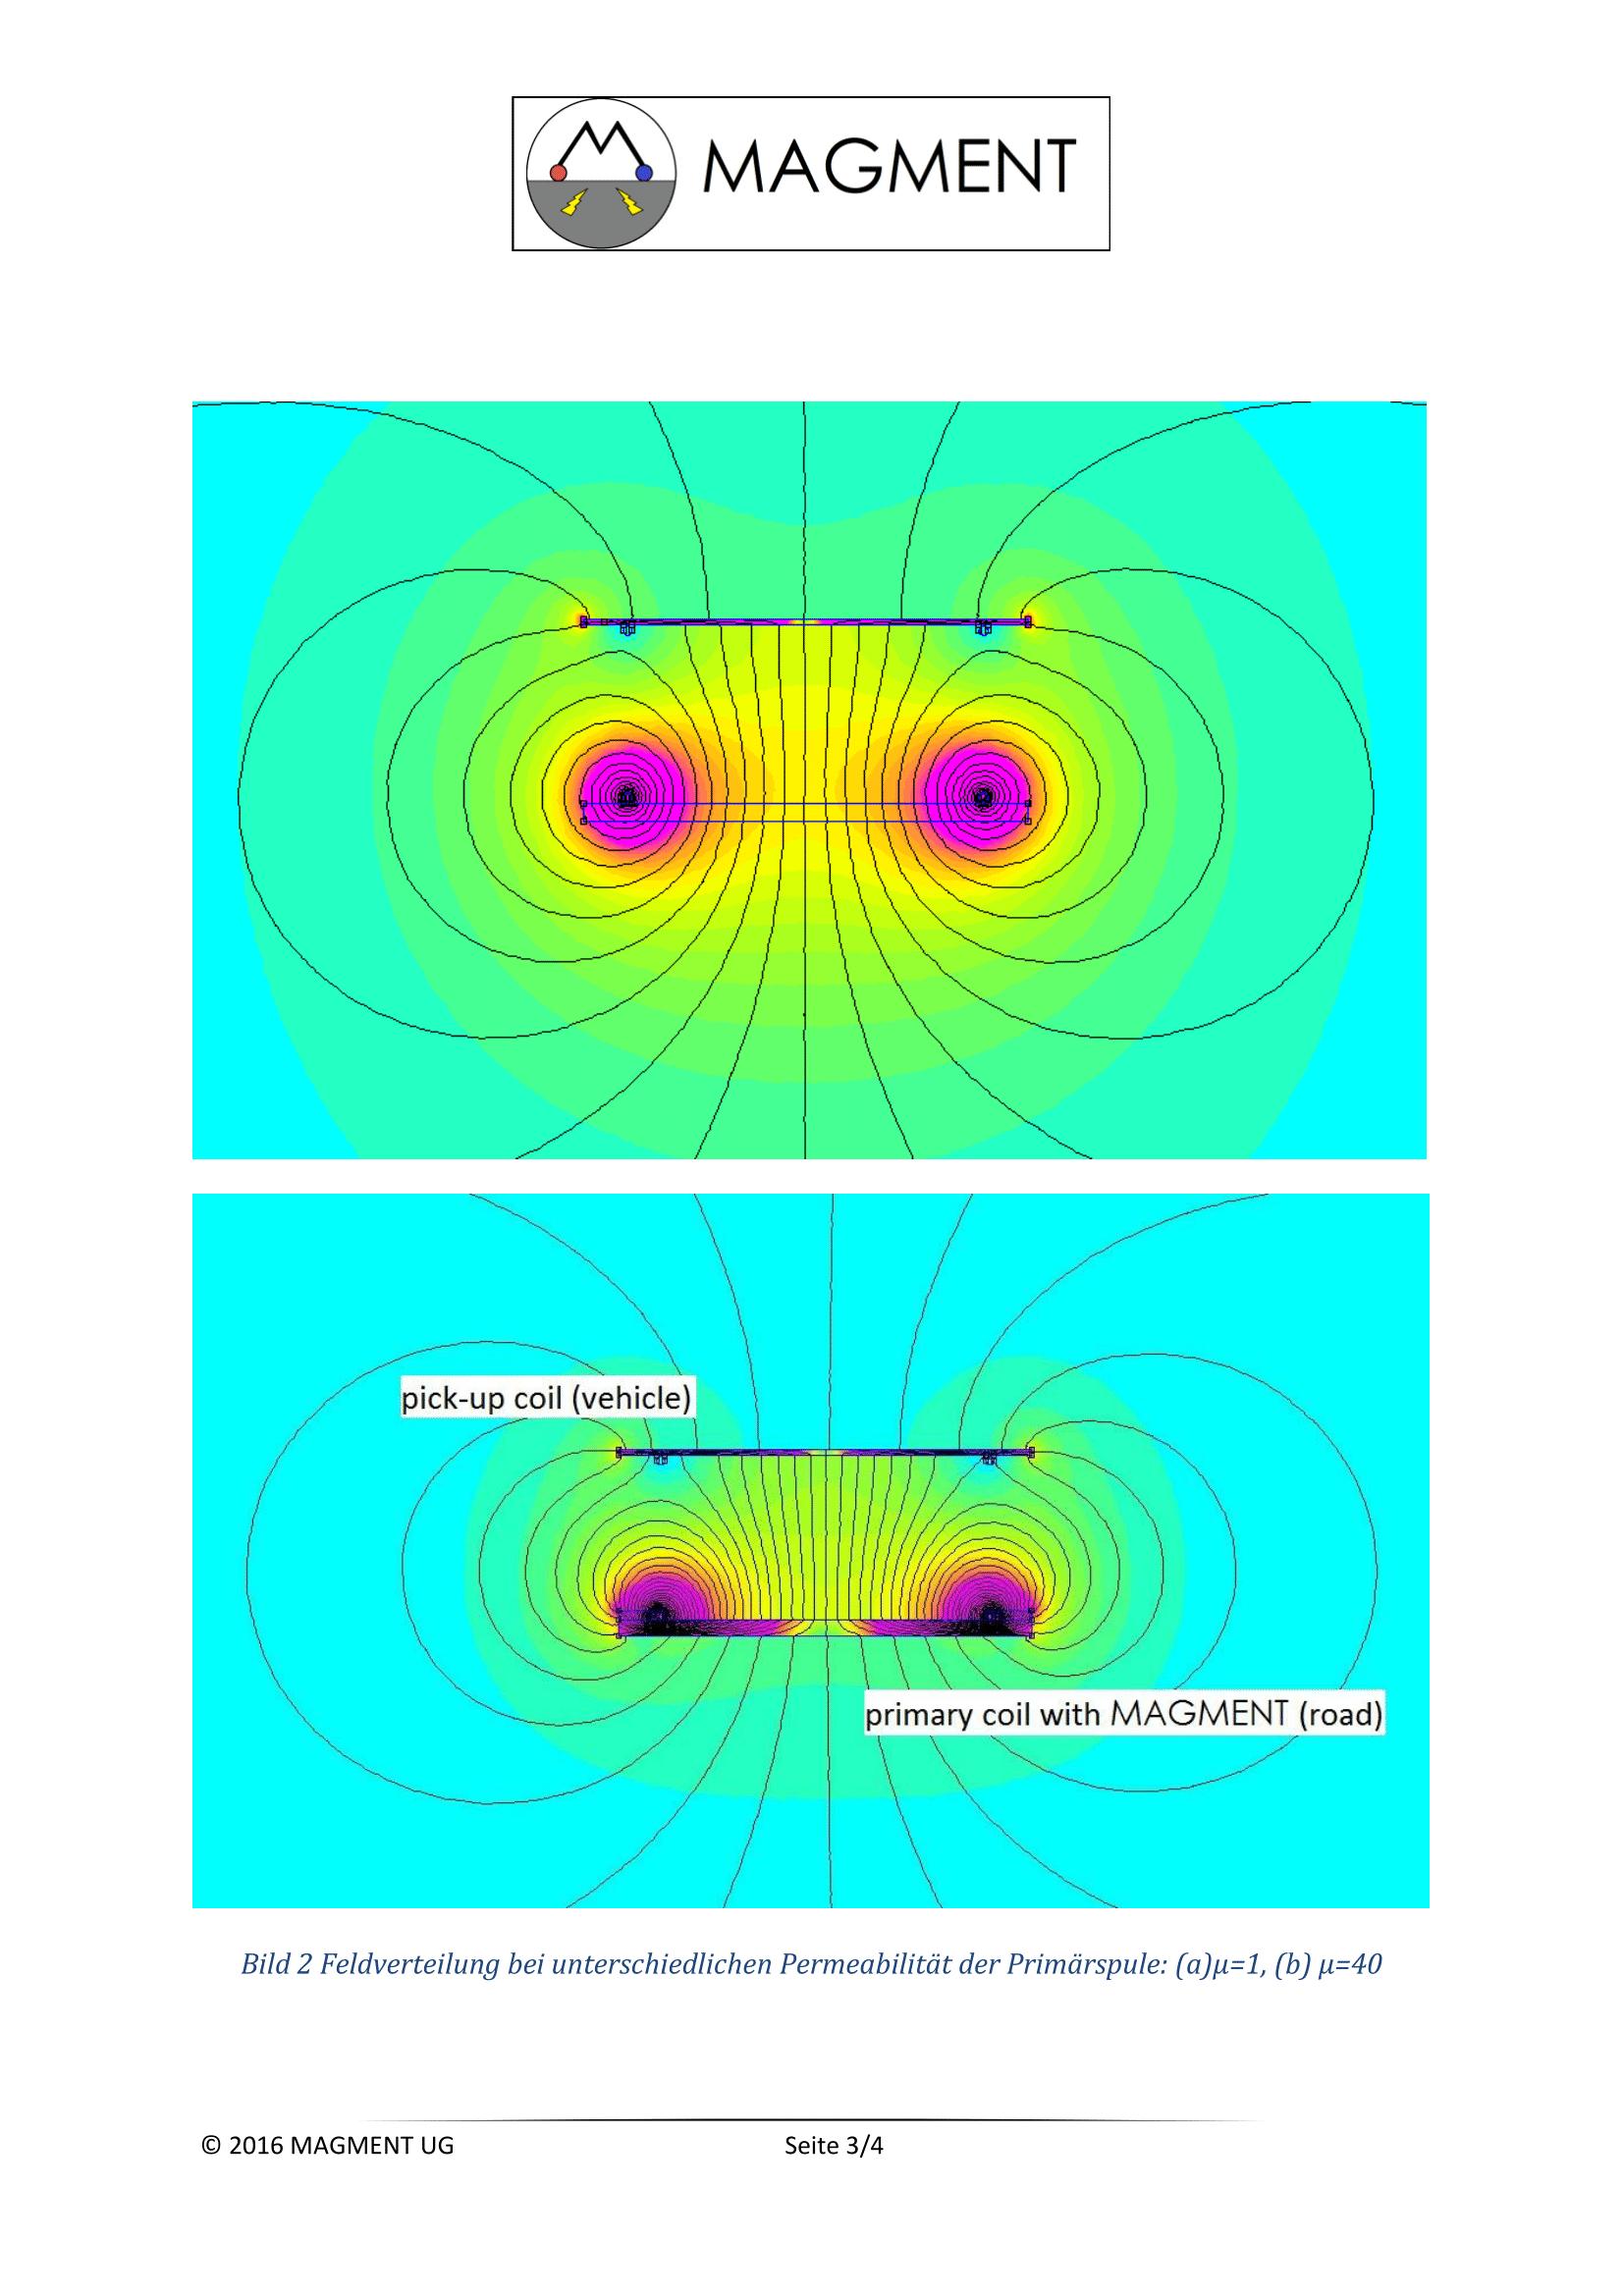 Induktive_Energieübertragung_mit_MAGMENT-3.png